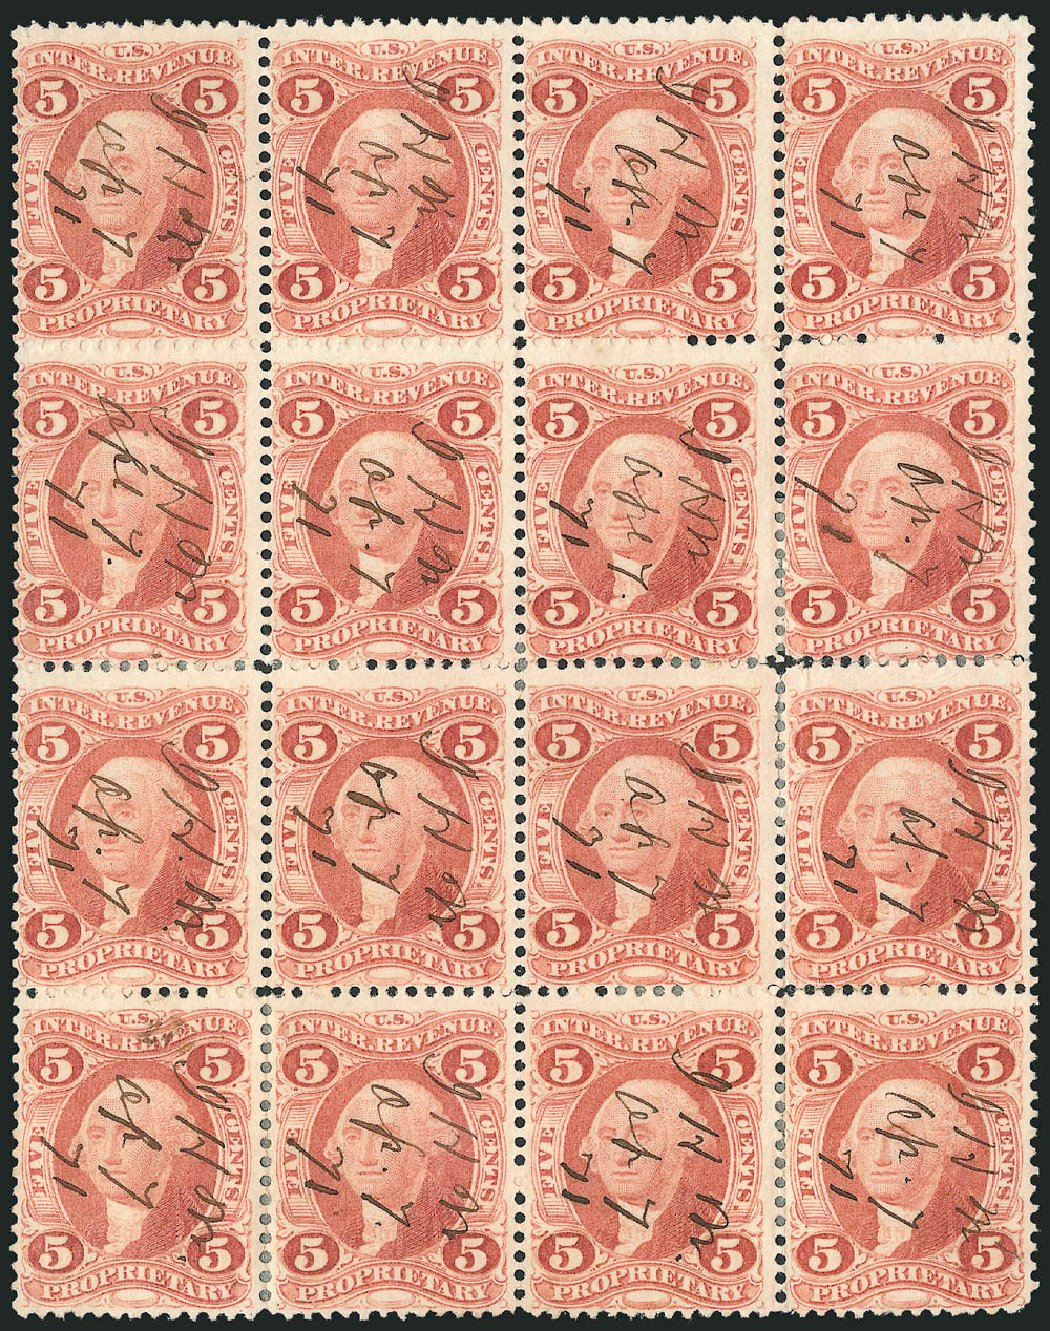 US Stamps Value Scott Catalog # R29 - 5c 1864 Revenue Proprietary. Robert Siegel Auction Galleries, Oct 2010, Sale 997, Lot 6574